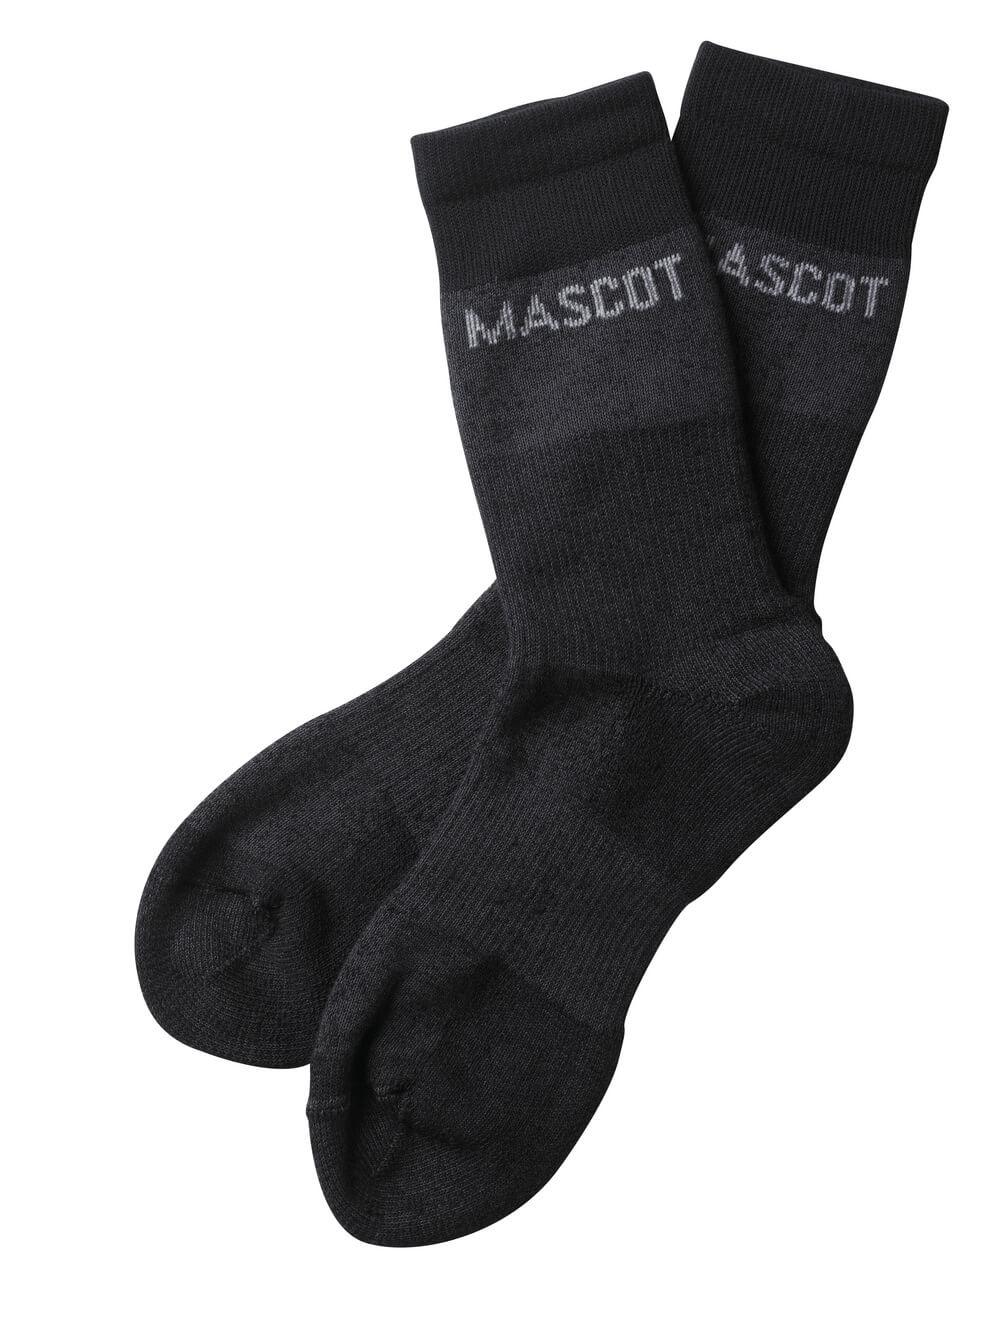 50406-877-A42 Socks - dark anthracite-flecked